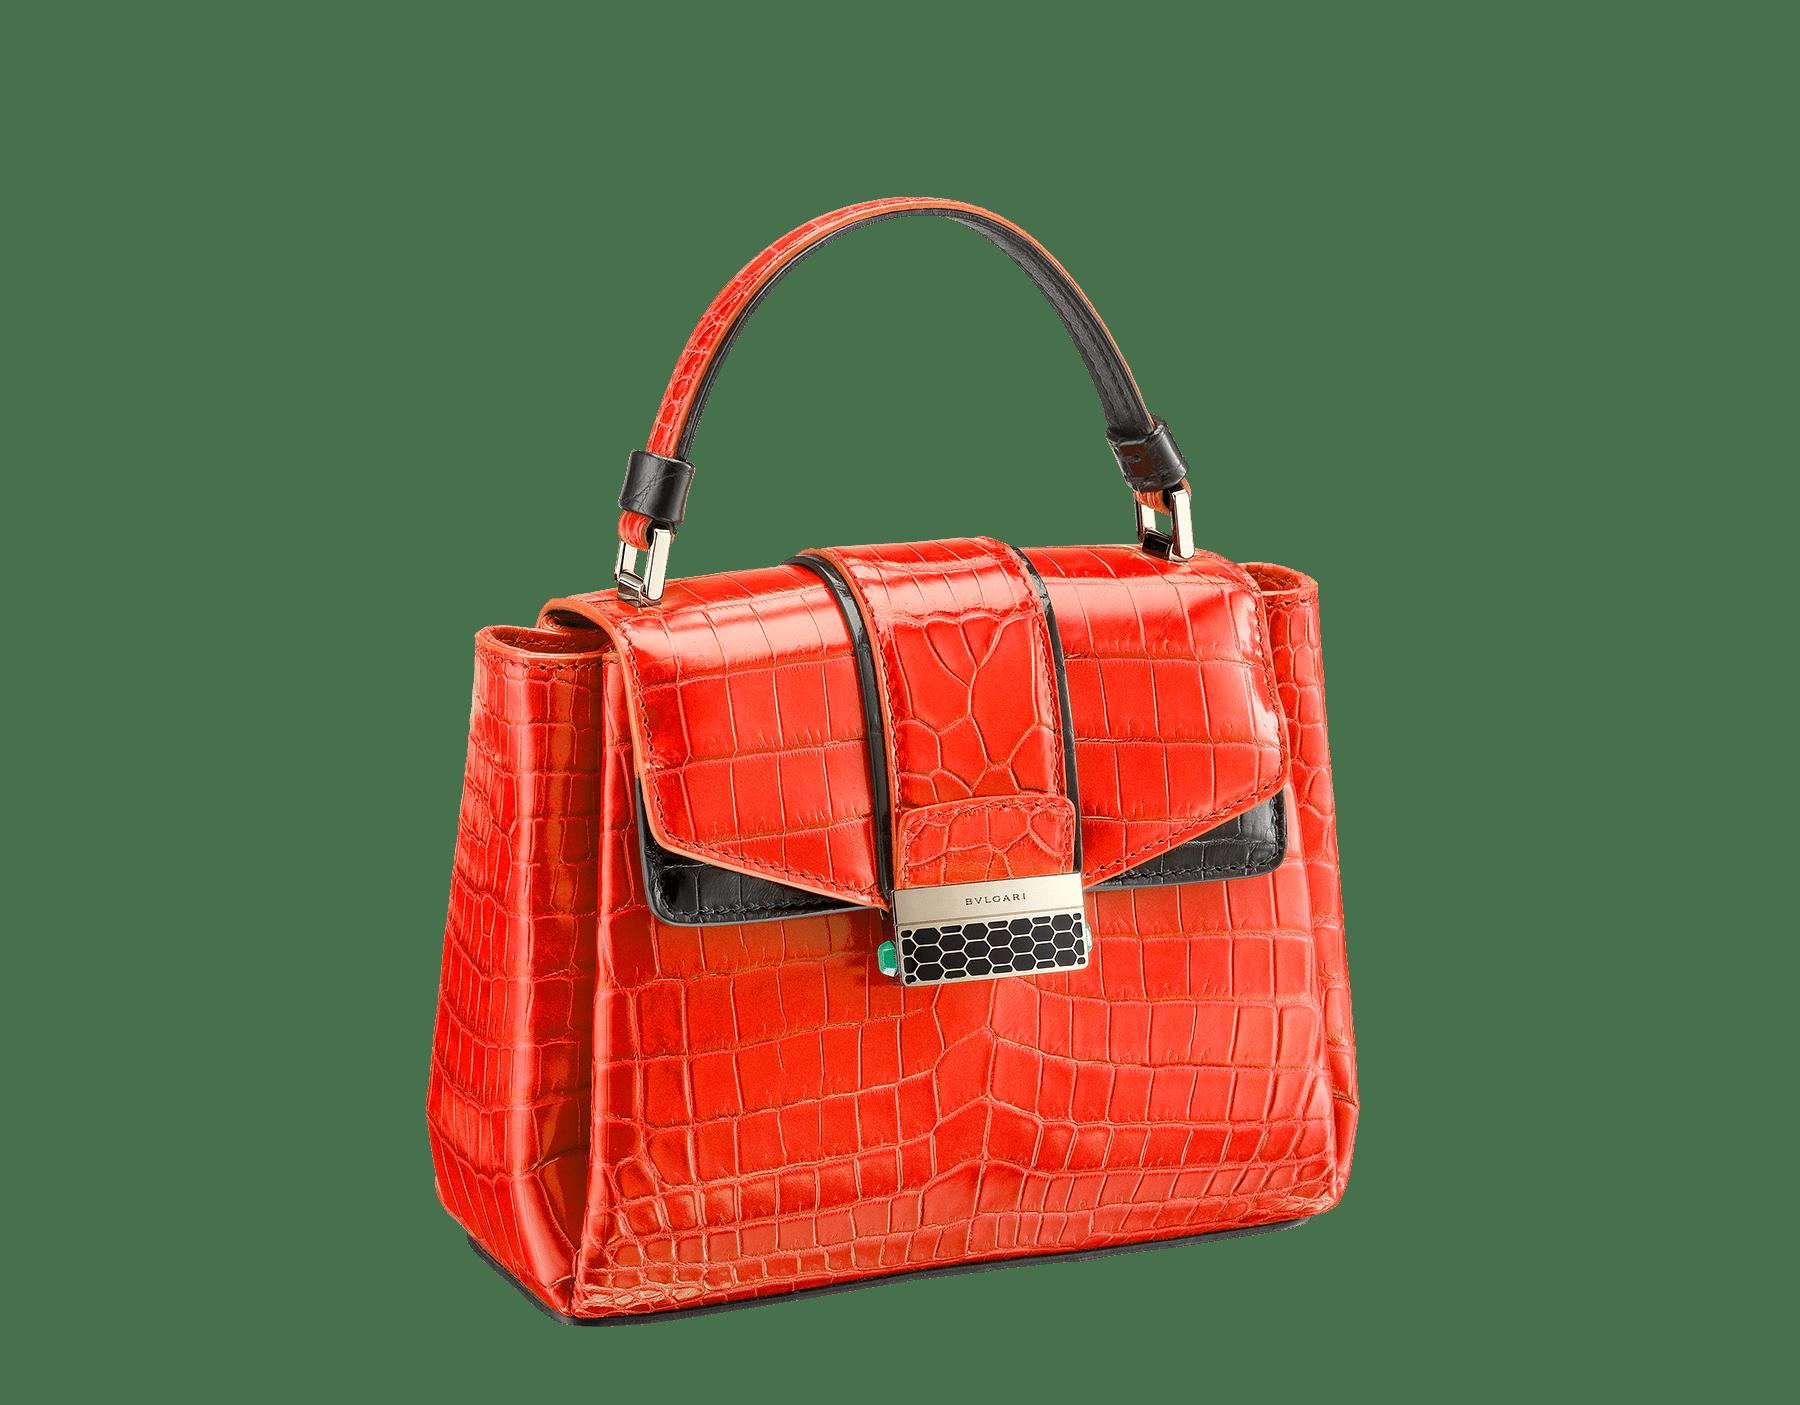 Top handle bag Serpenti Viper in jasper flame and black shiny crocodile skin. 282925 image 2